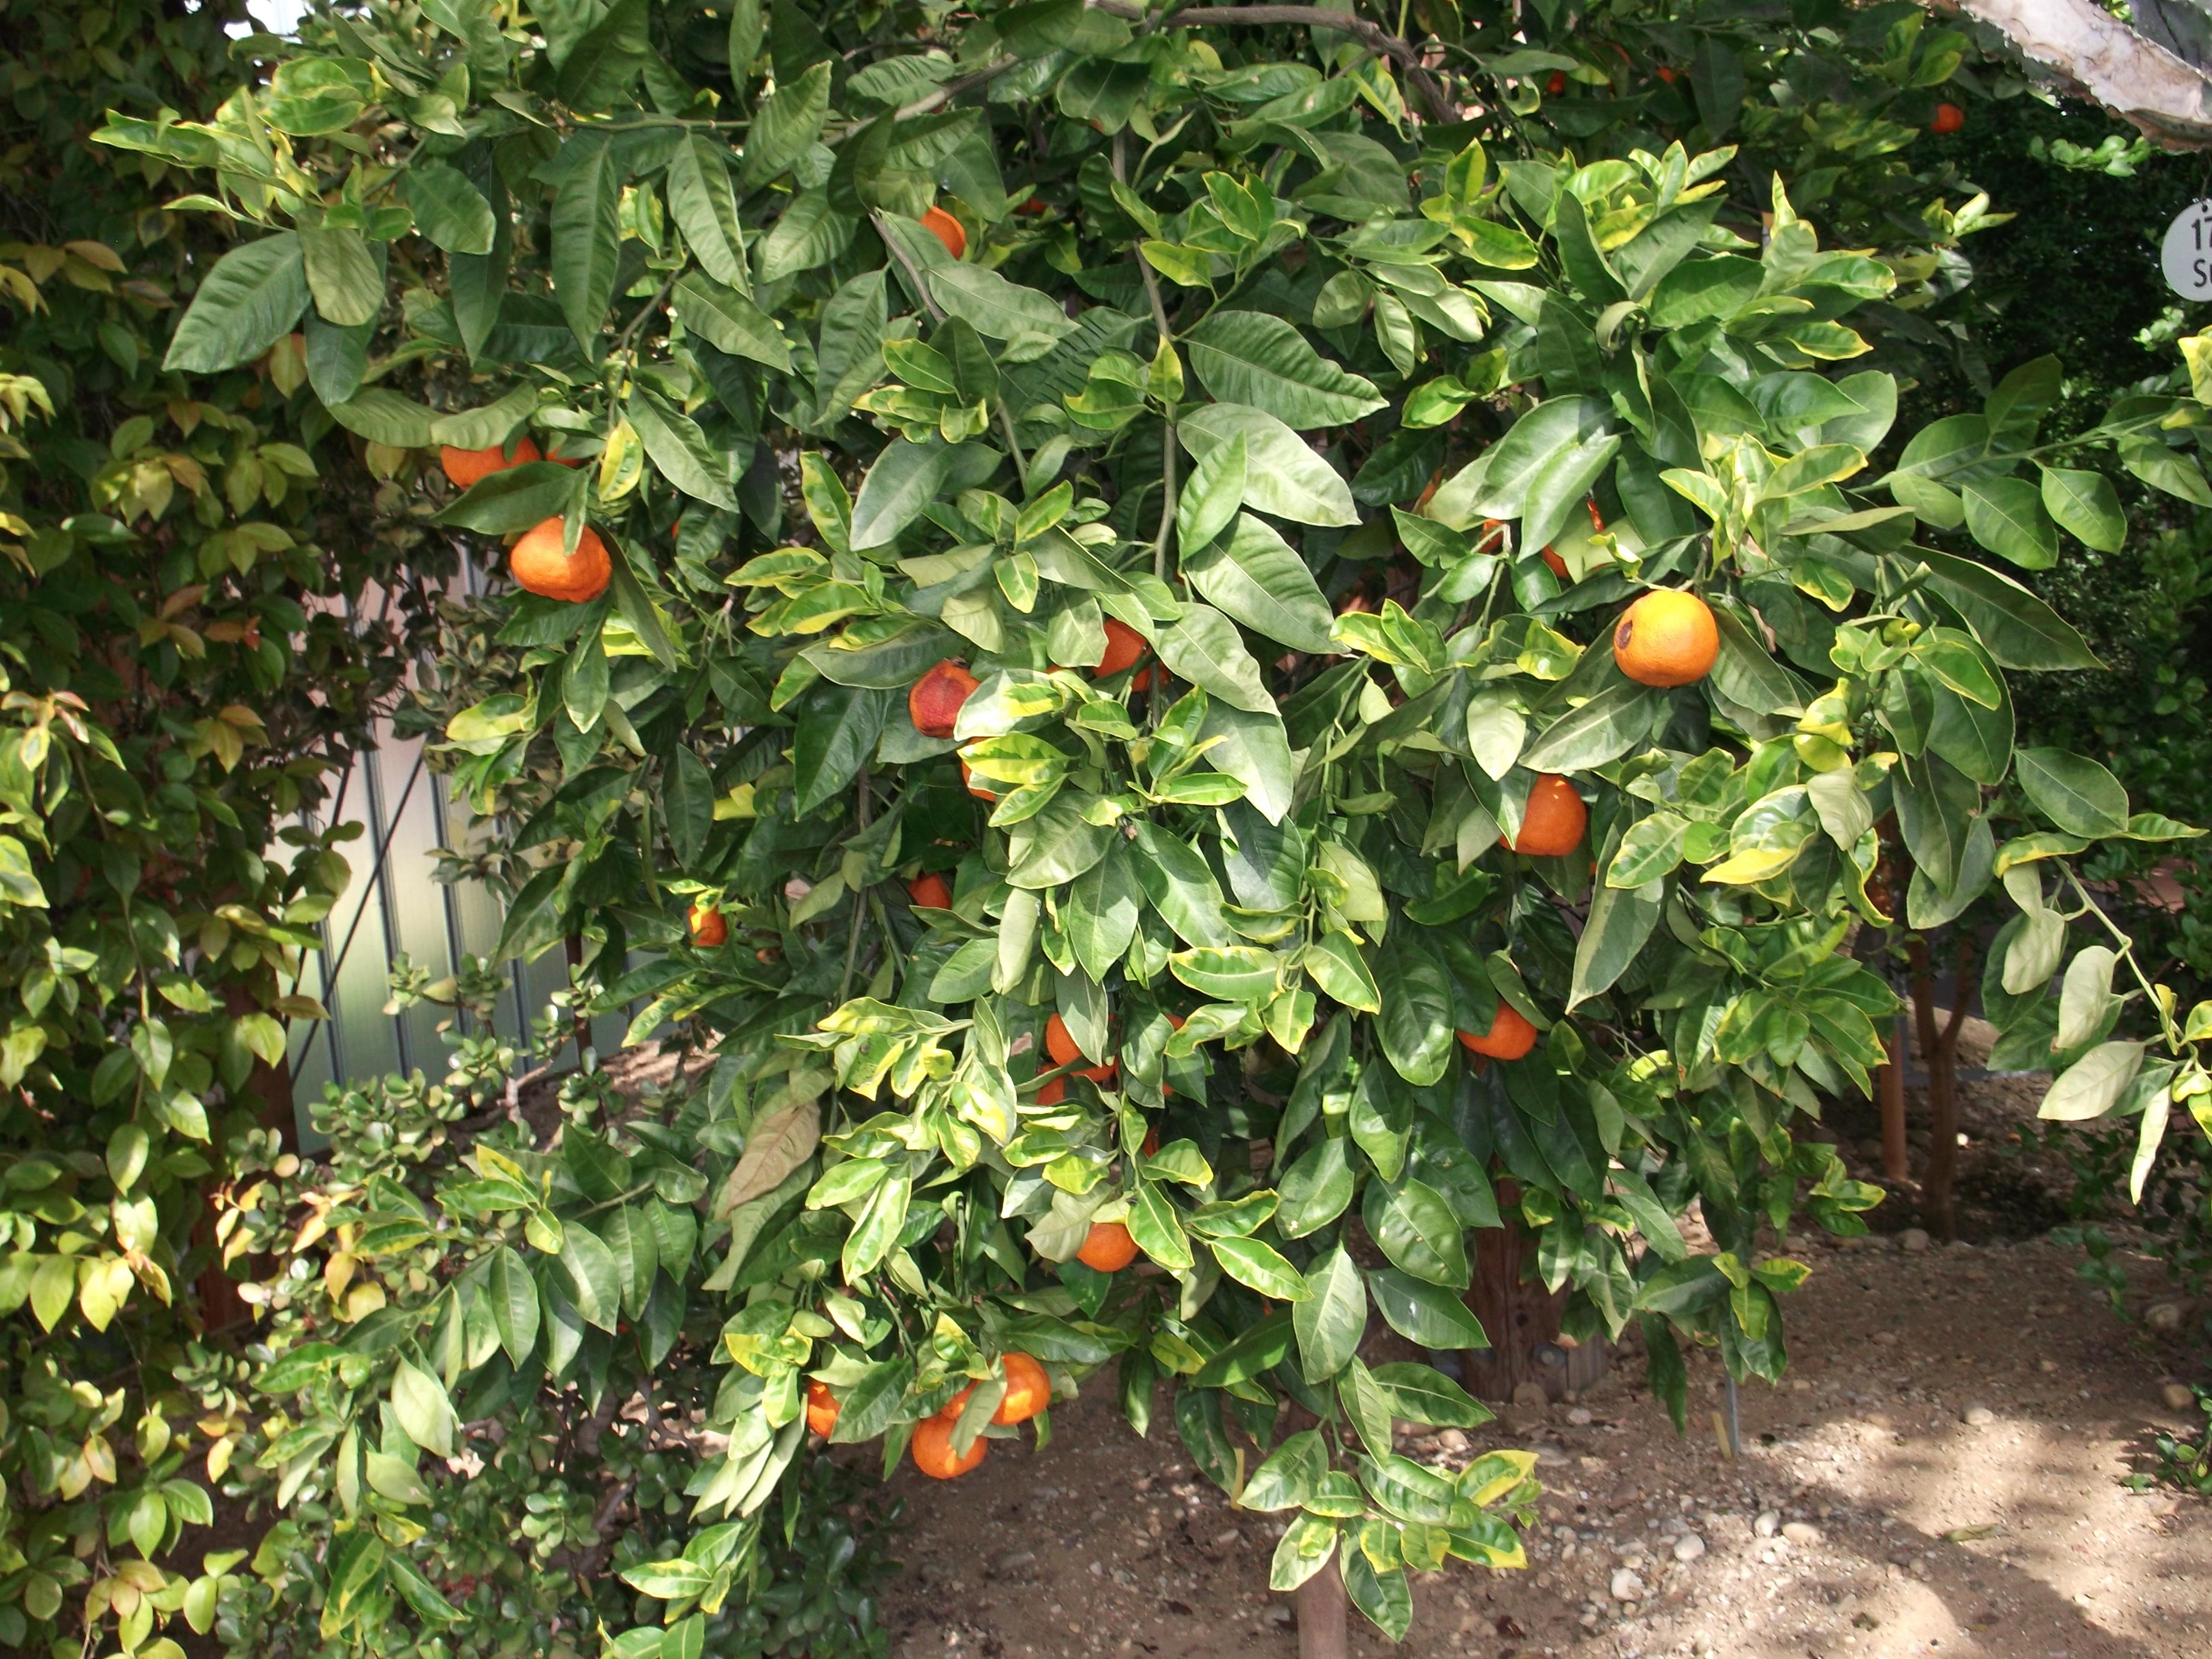 Agrumes conseil jardinage application en phytoth rapie for Conseil jardinage